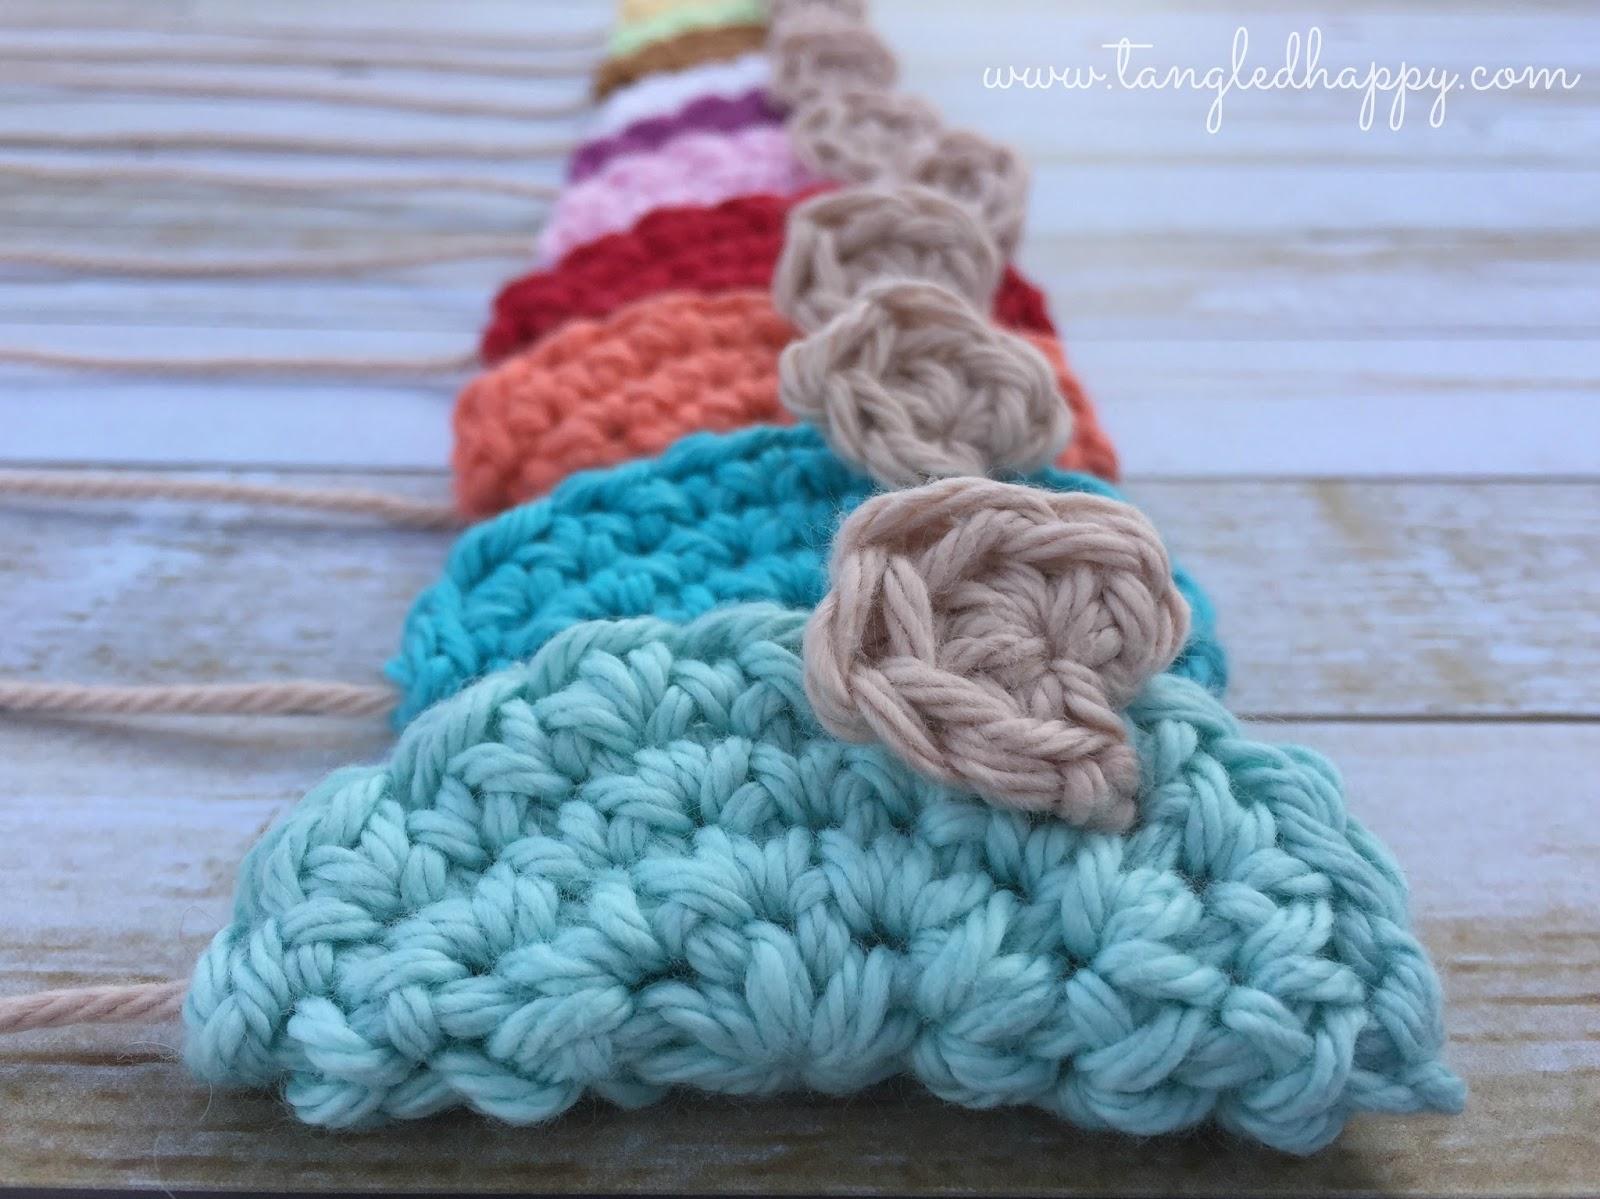 tangled happy: Crochet Mouse DIY Cat Toy {Free Crochet Pattern}